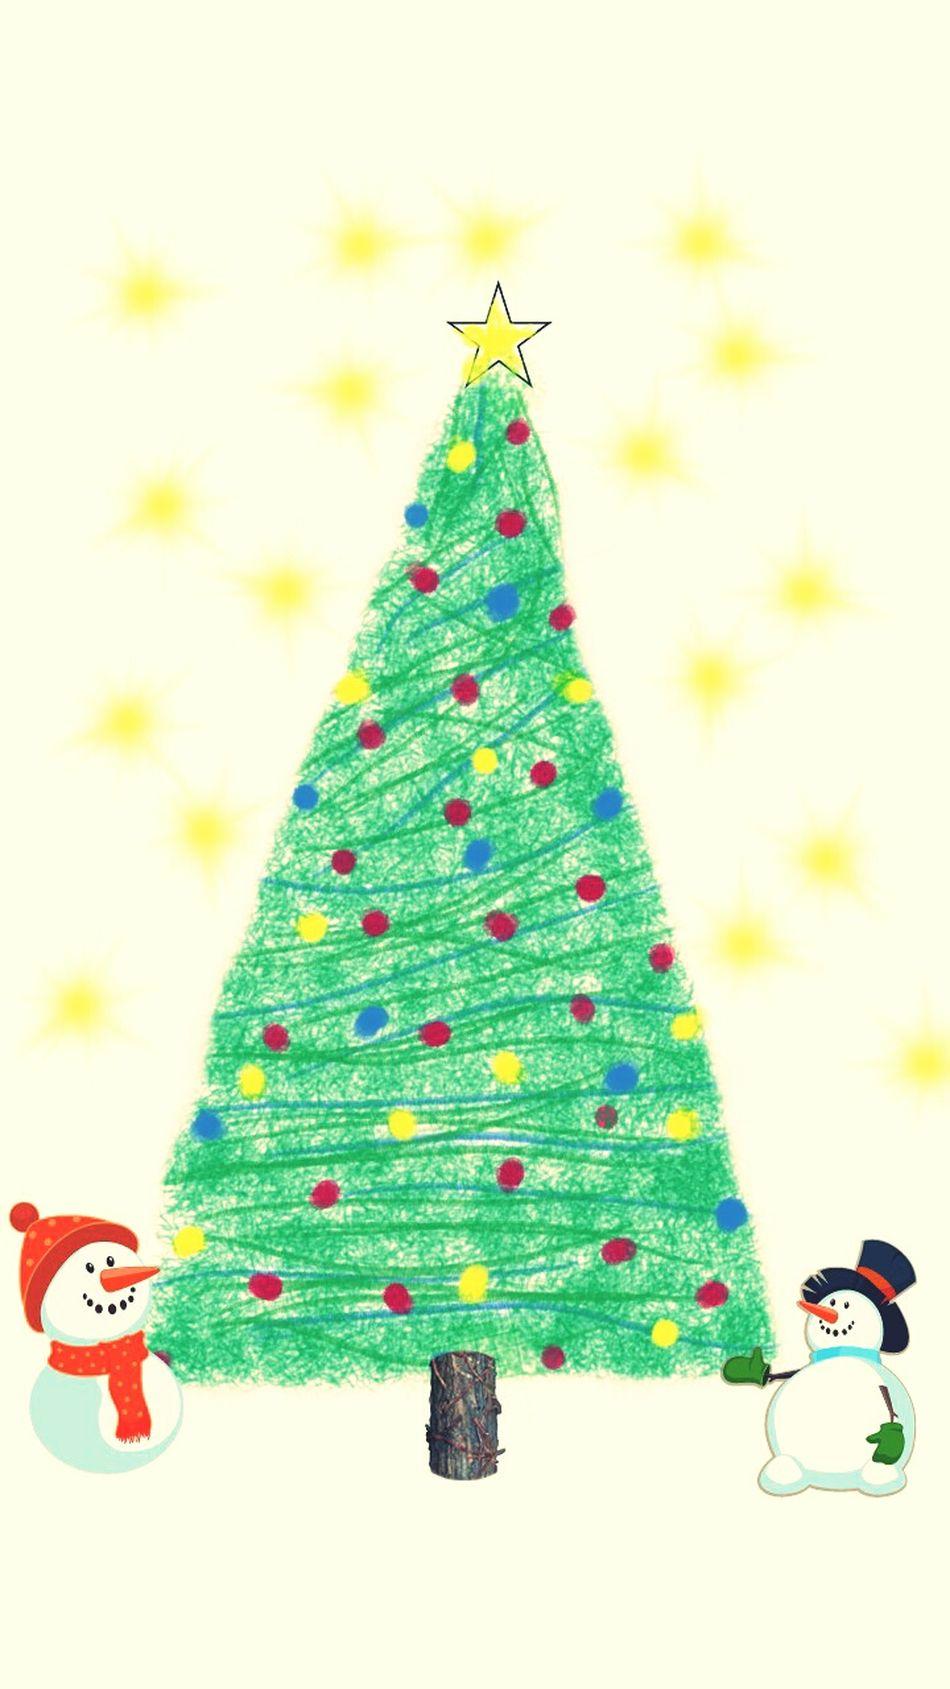 Happy Christmas Snowmen Tree Christmas Tree Decorating My Drawings Art And Craft This Is My Art!!! Having Fun :) Holiday Season Its Coming,,